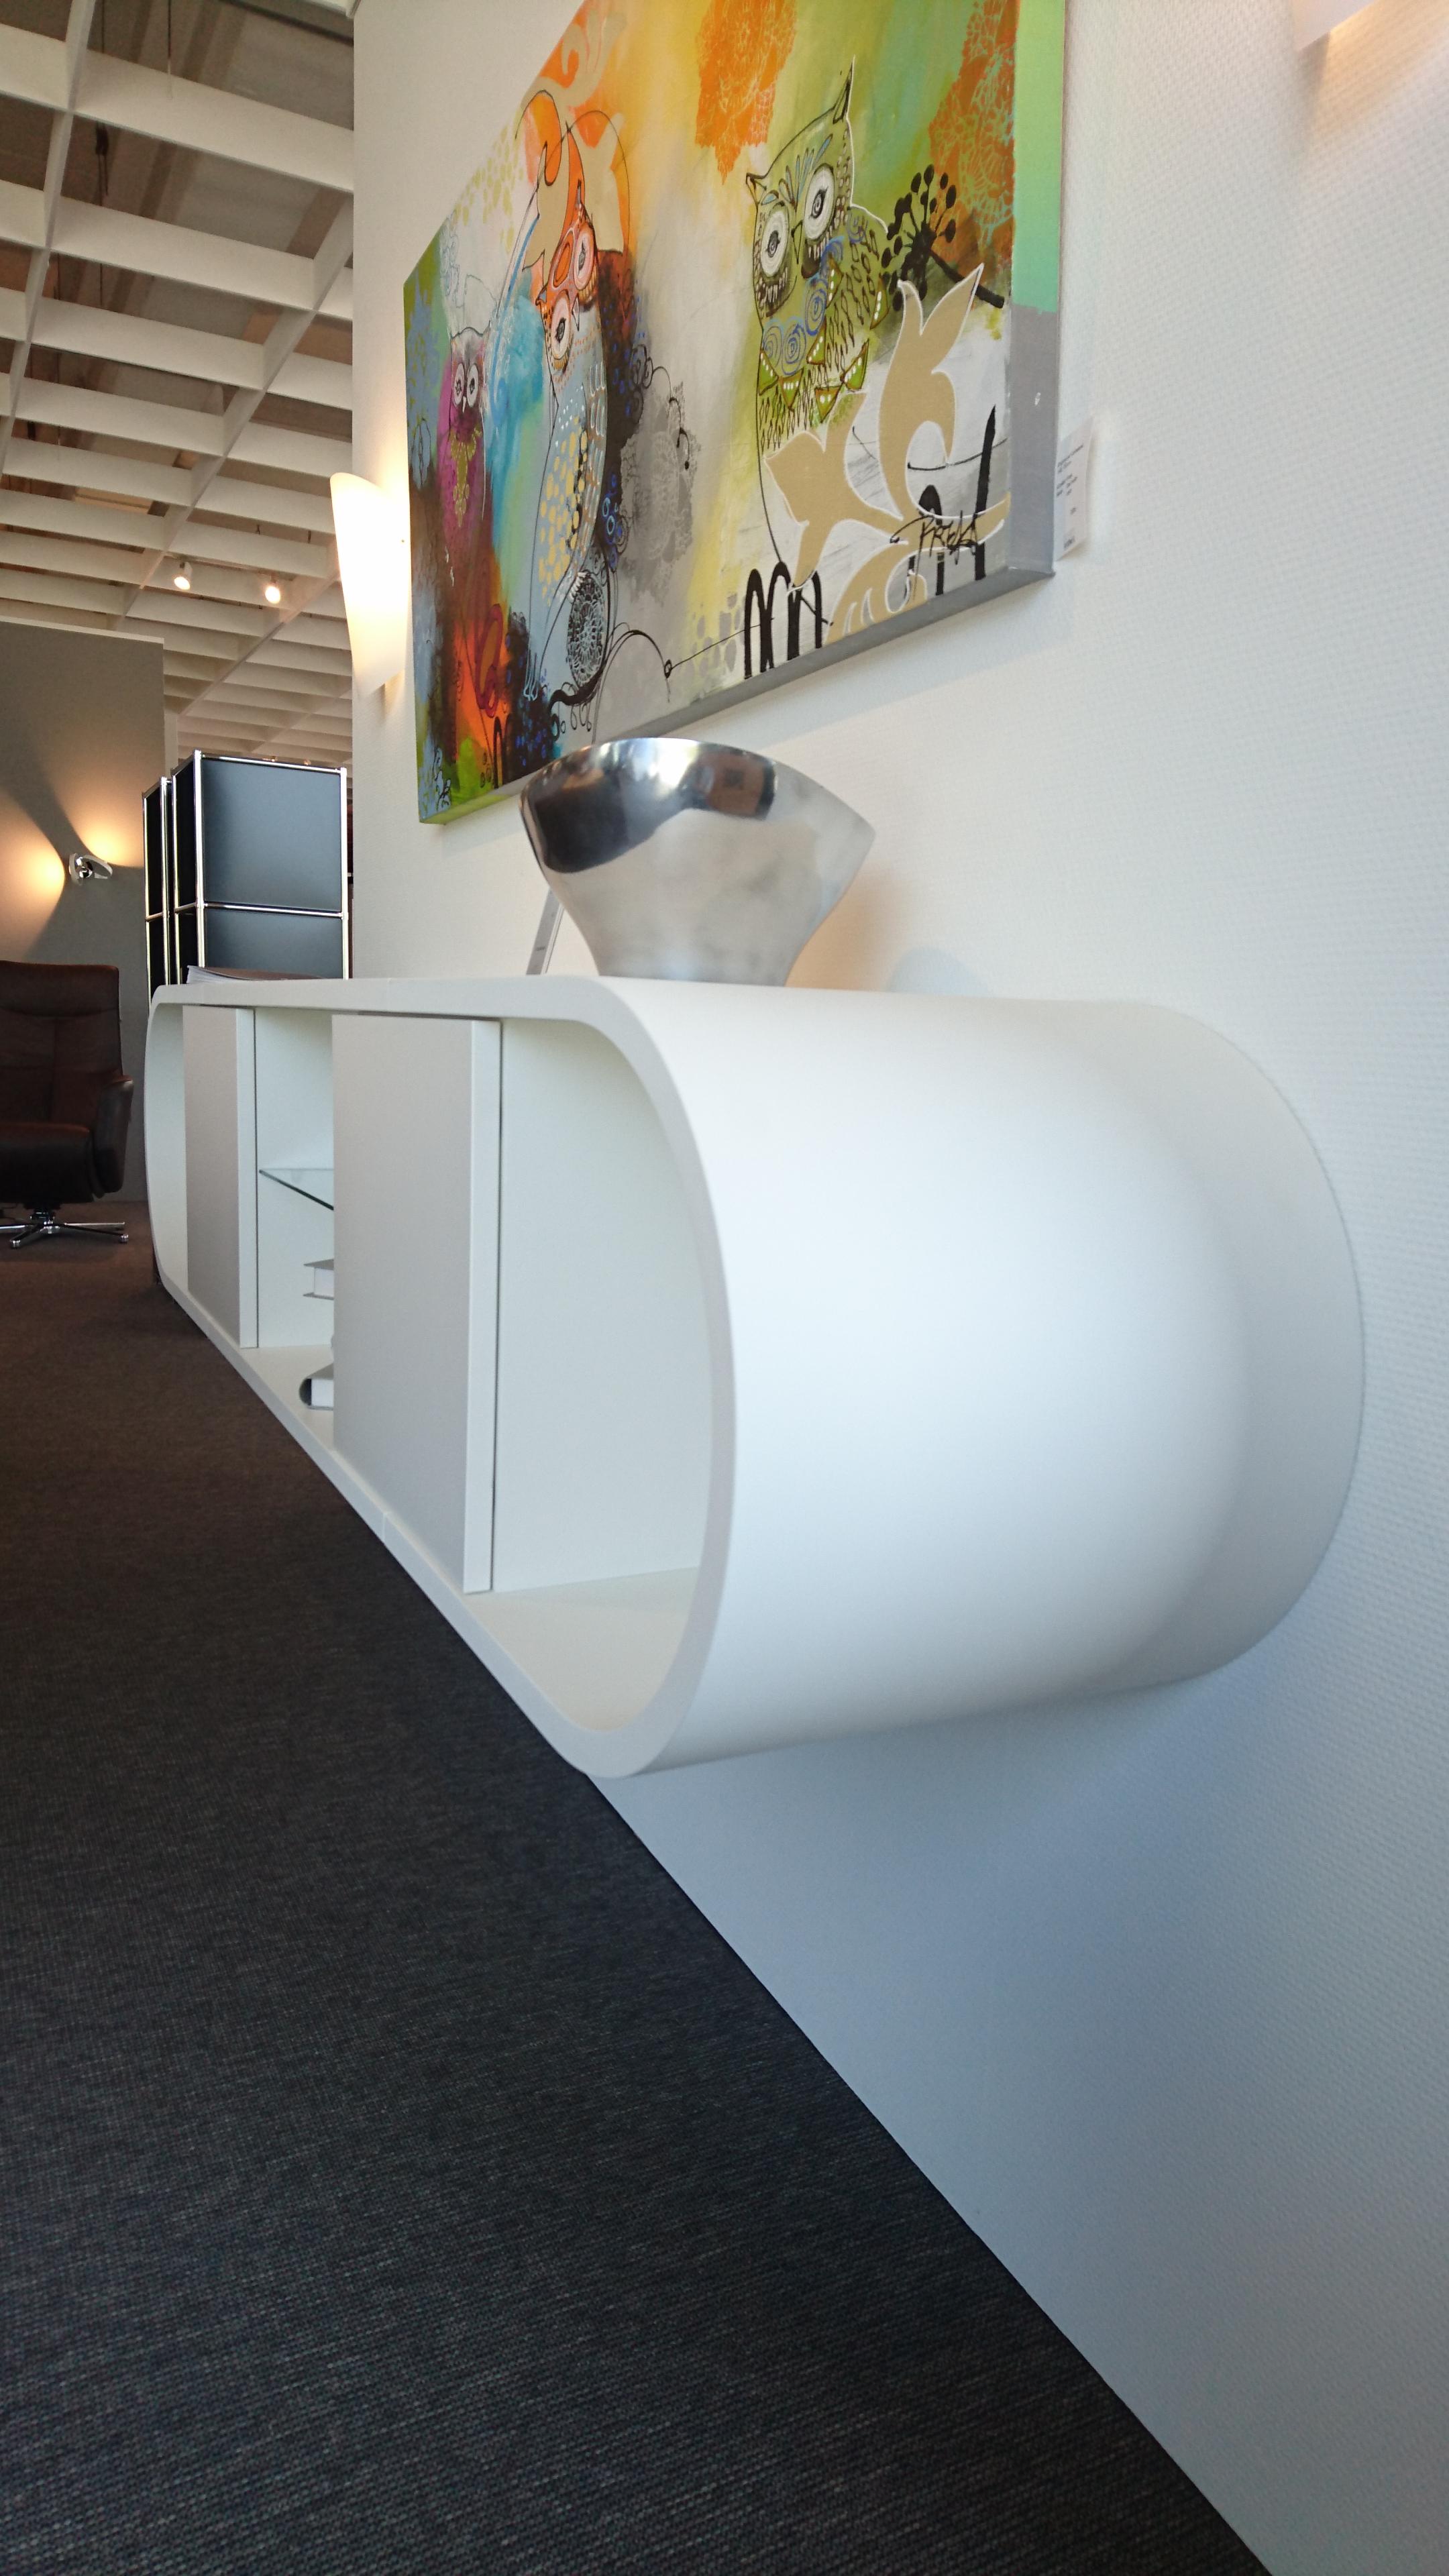 Kommode  bei Möbel Klingl GmbH